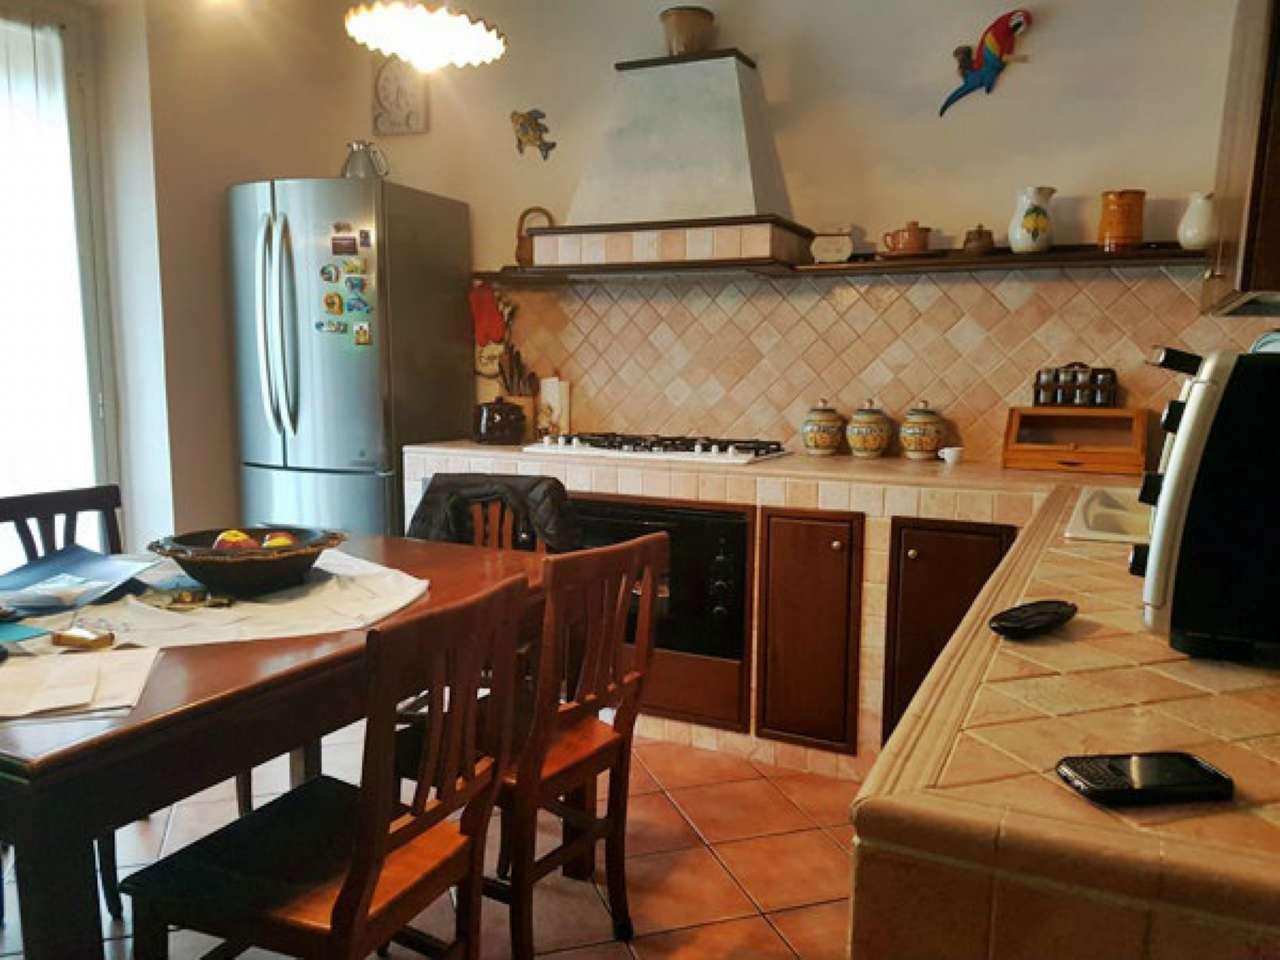 Appartamento in vendita 4 vani 115 mq.  via FRATELLI ZOIA  201 Milano